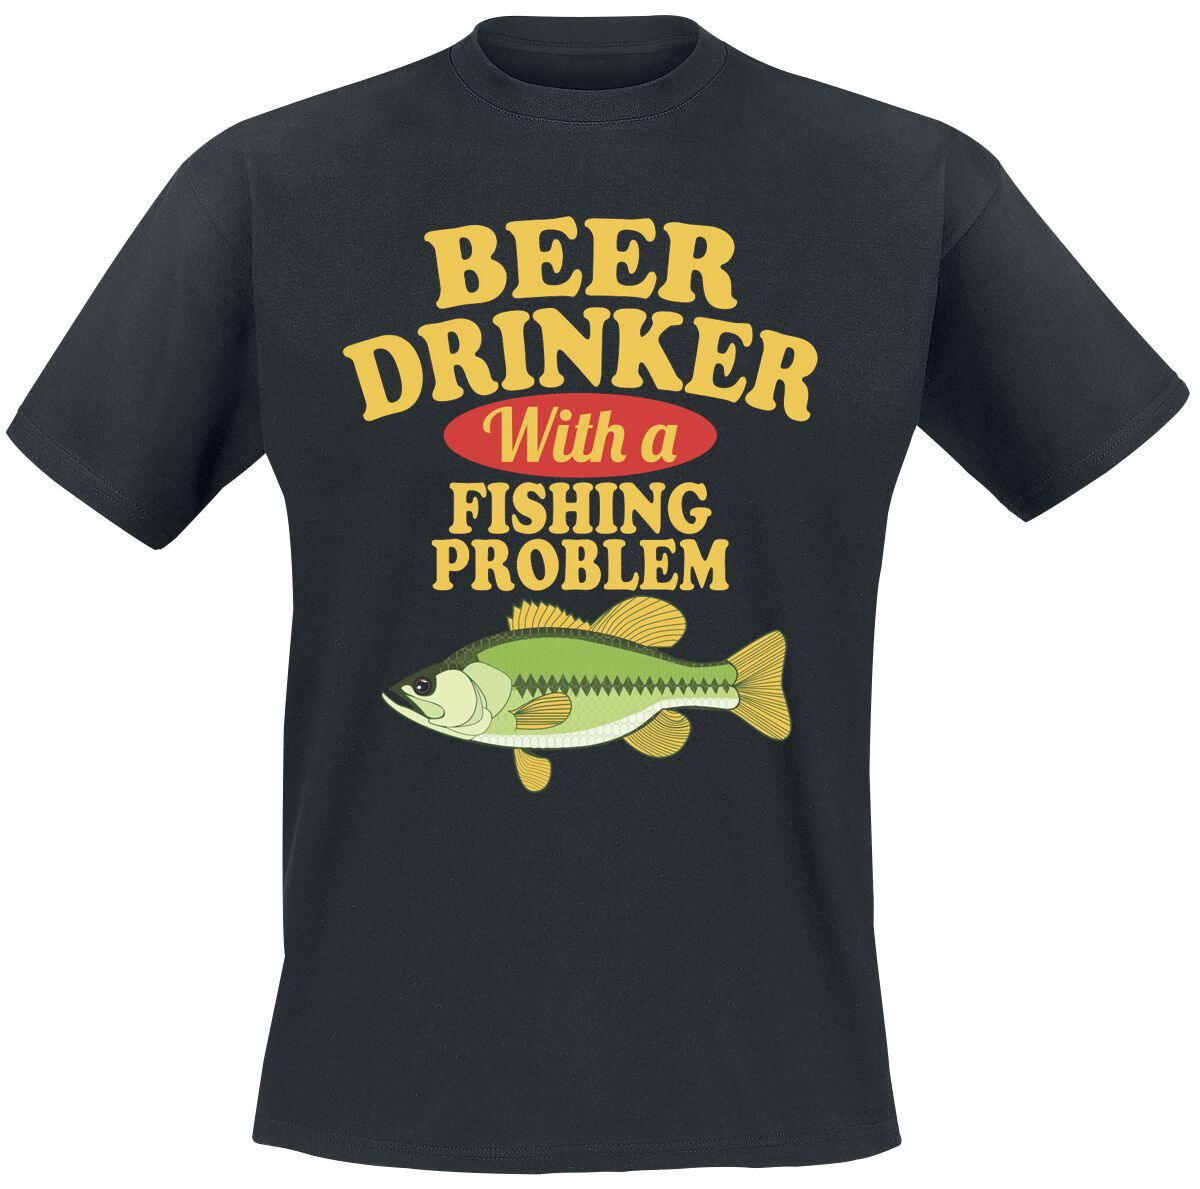 Fun Shirts - Koszulki - T-Shirt Beer Drinker With A Fishing Problem T-Shirt czarny - 376571